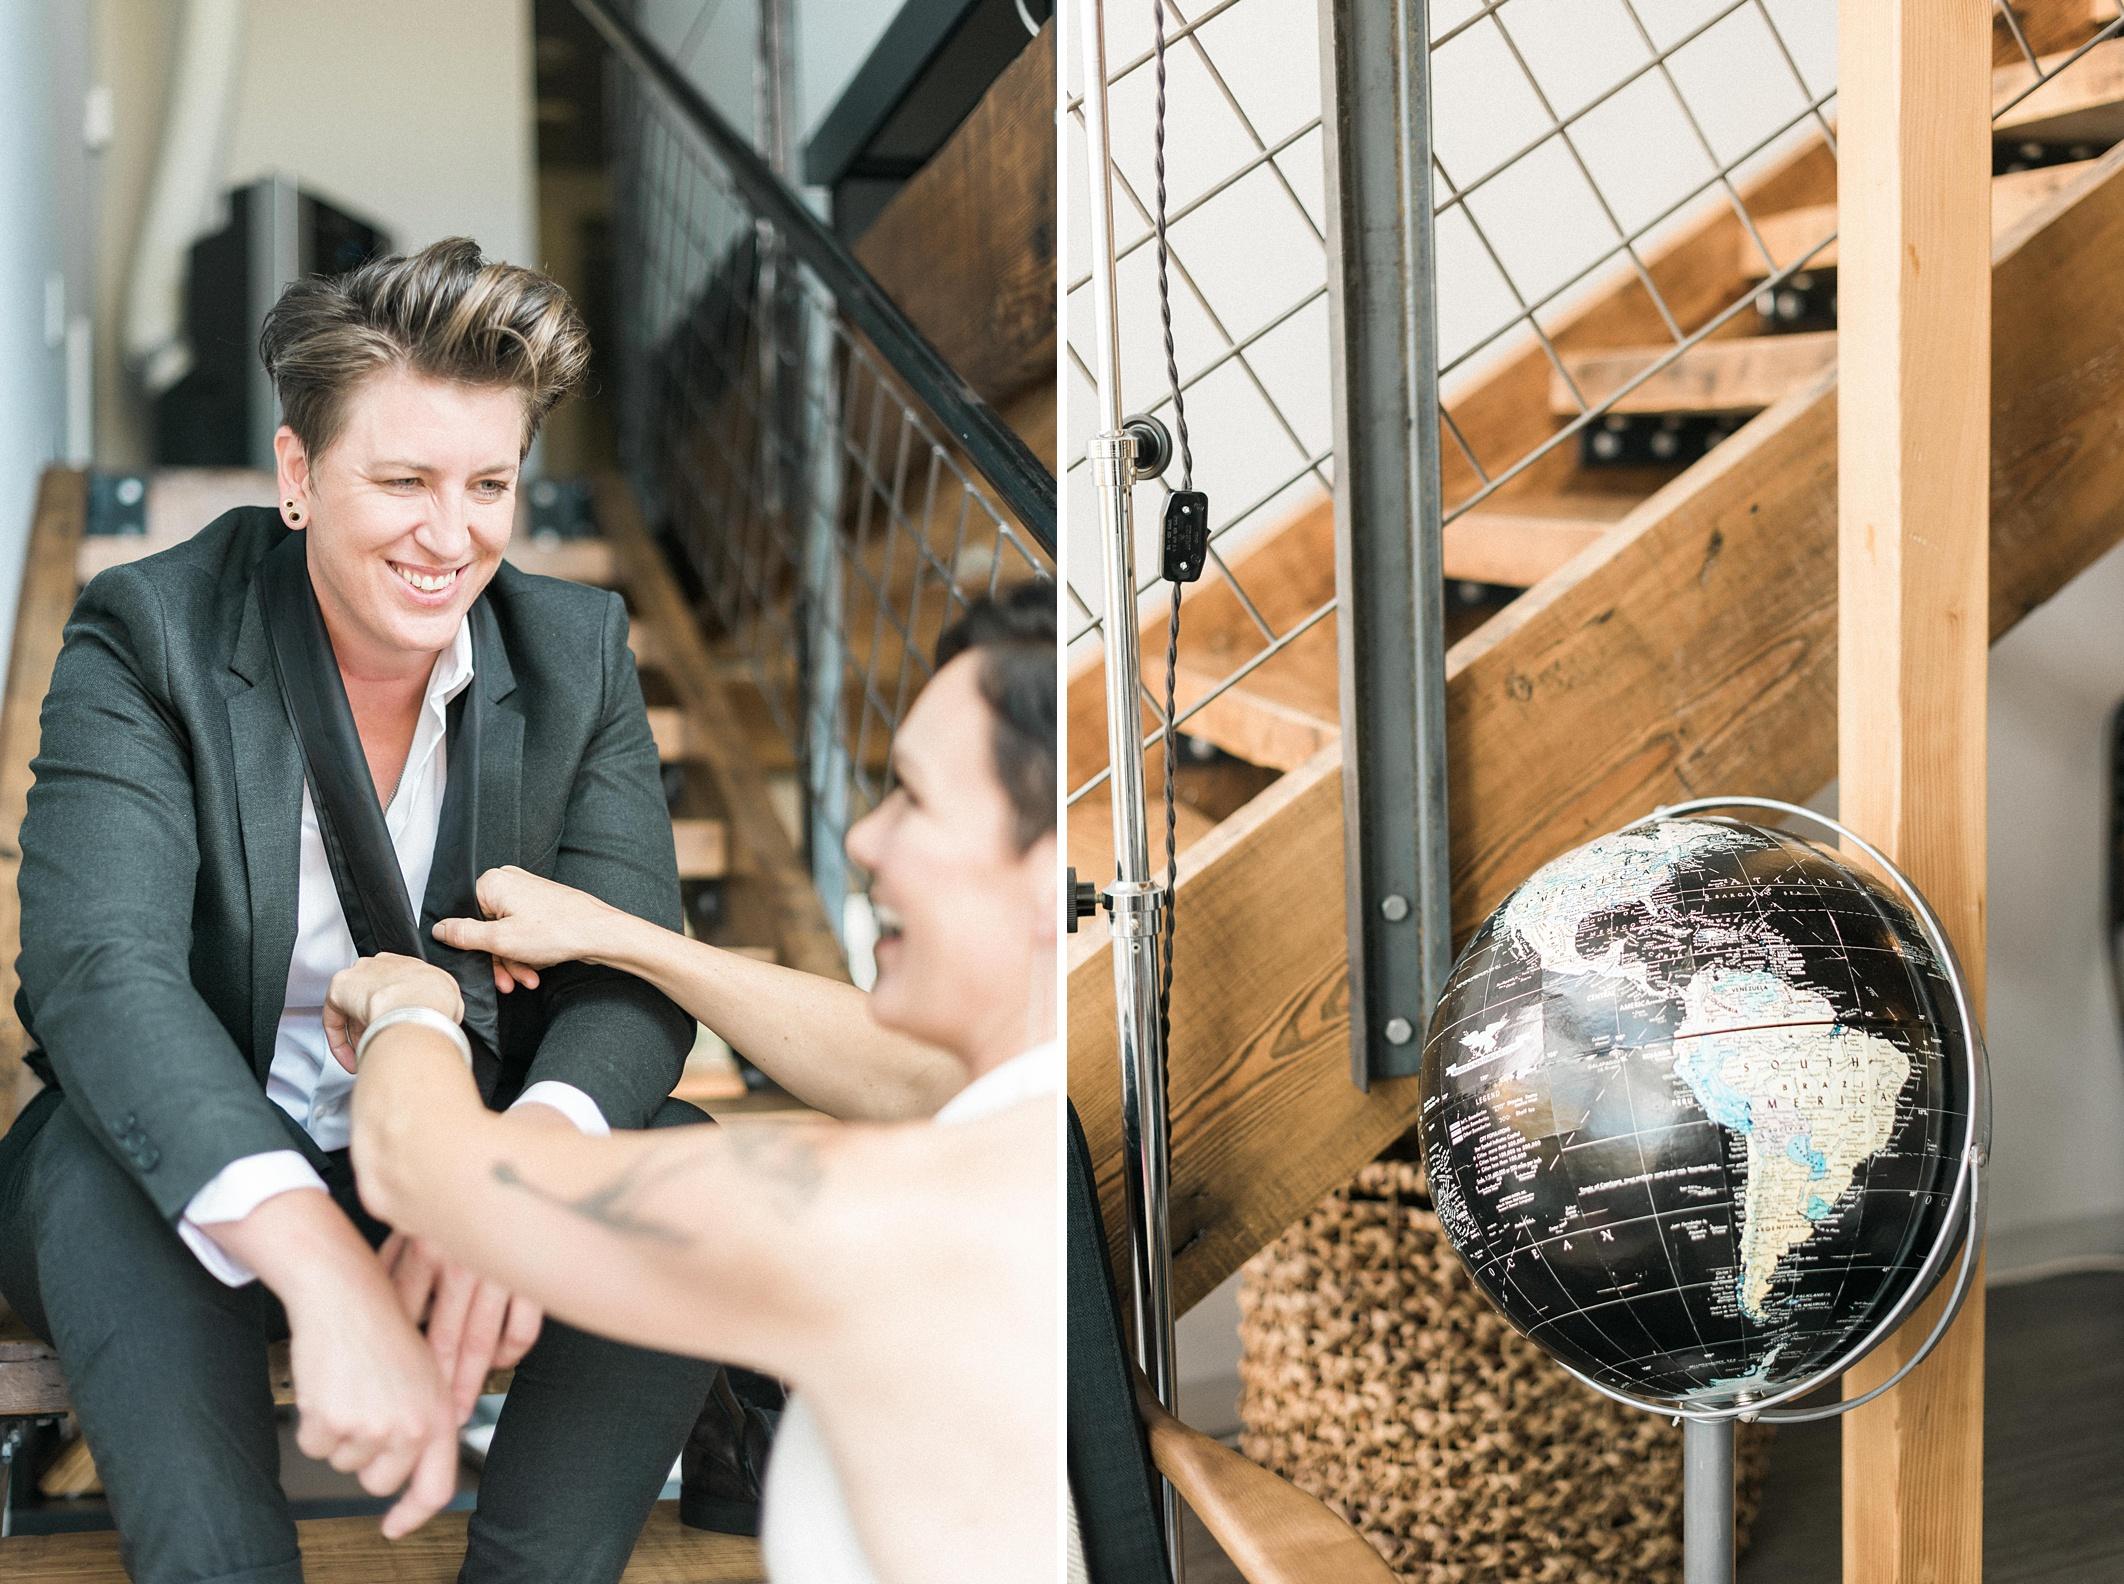 Lesbian Industrial chic hipster wedding. Bloom by Tara. Seattle